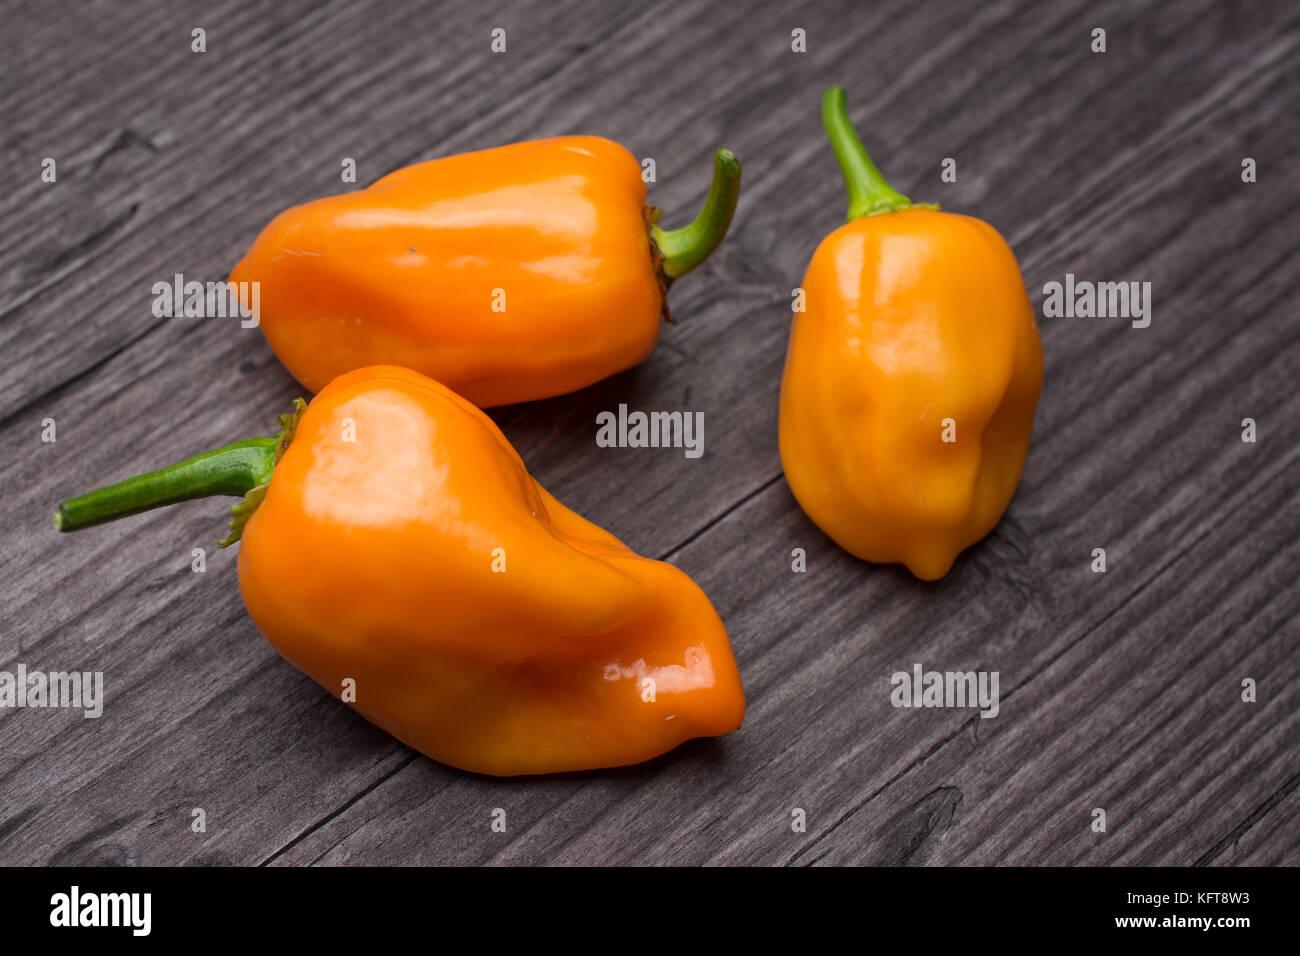 some vegetable of orange chili pepper habanero on wooden vintage background Stock Photo